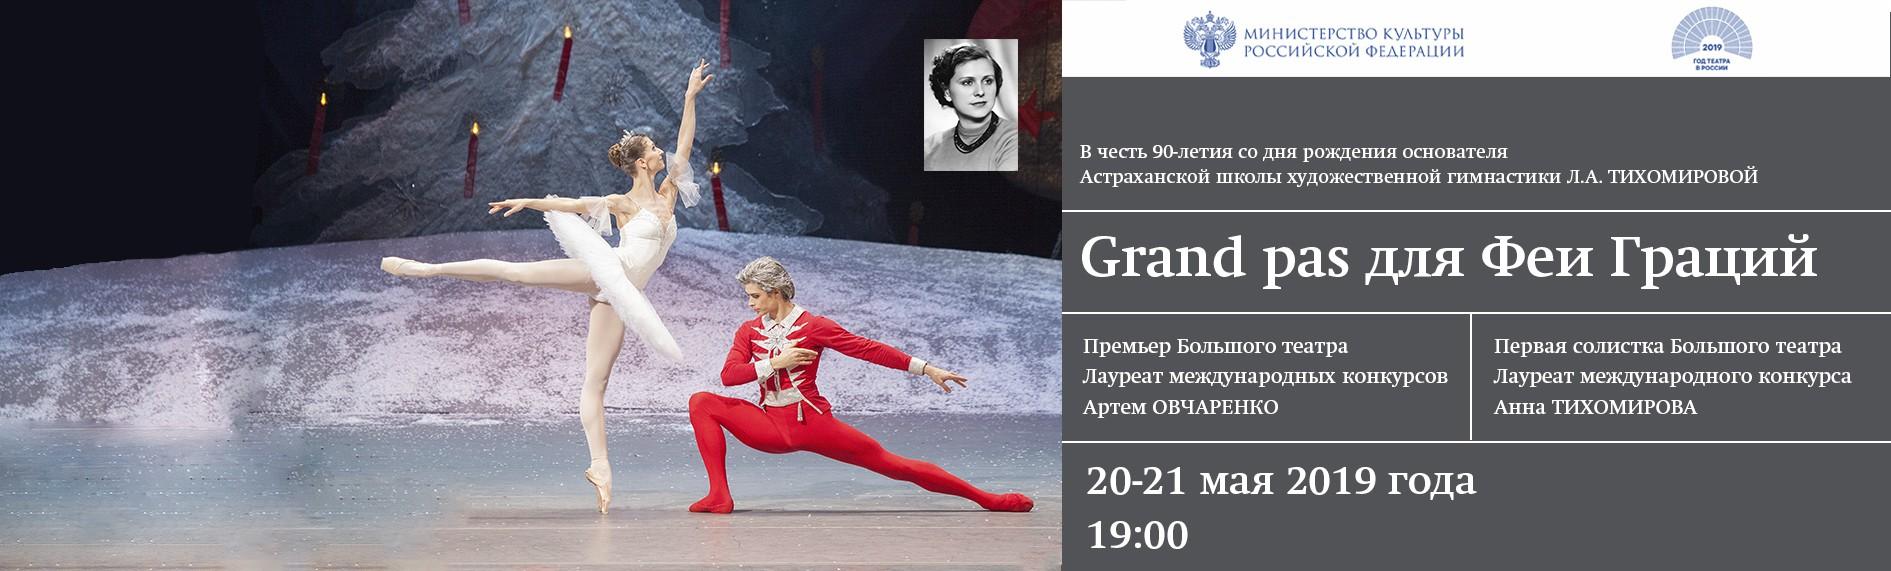 """Grand pas для Феи Граций"". Гала-концерт звёзд Большого театра"